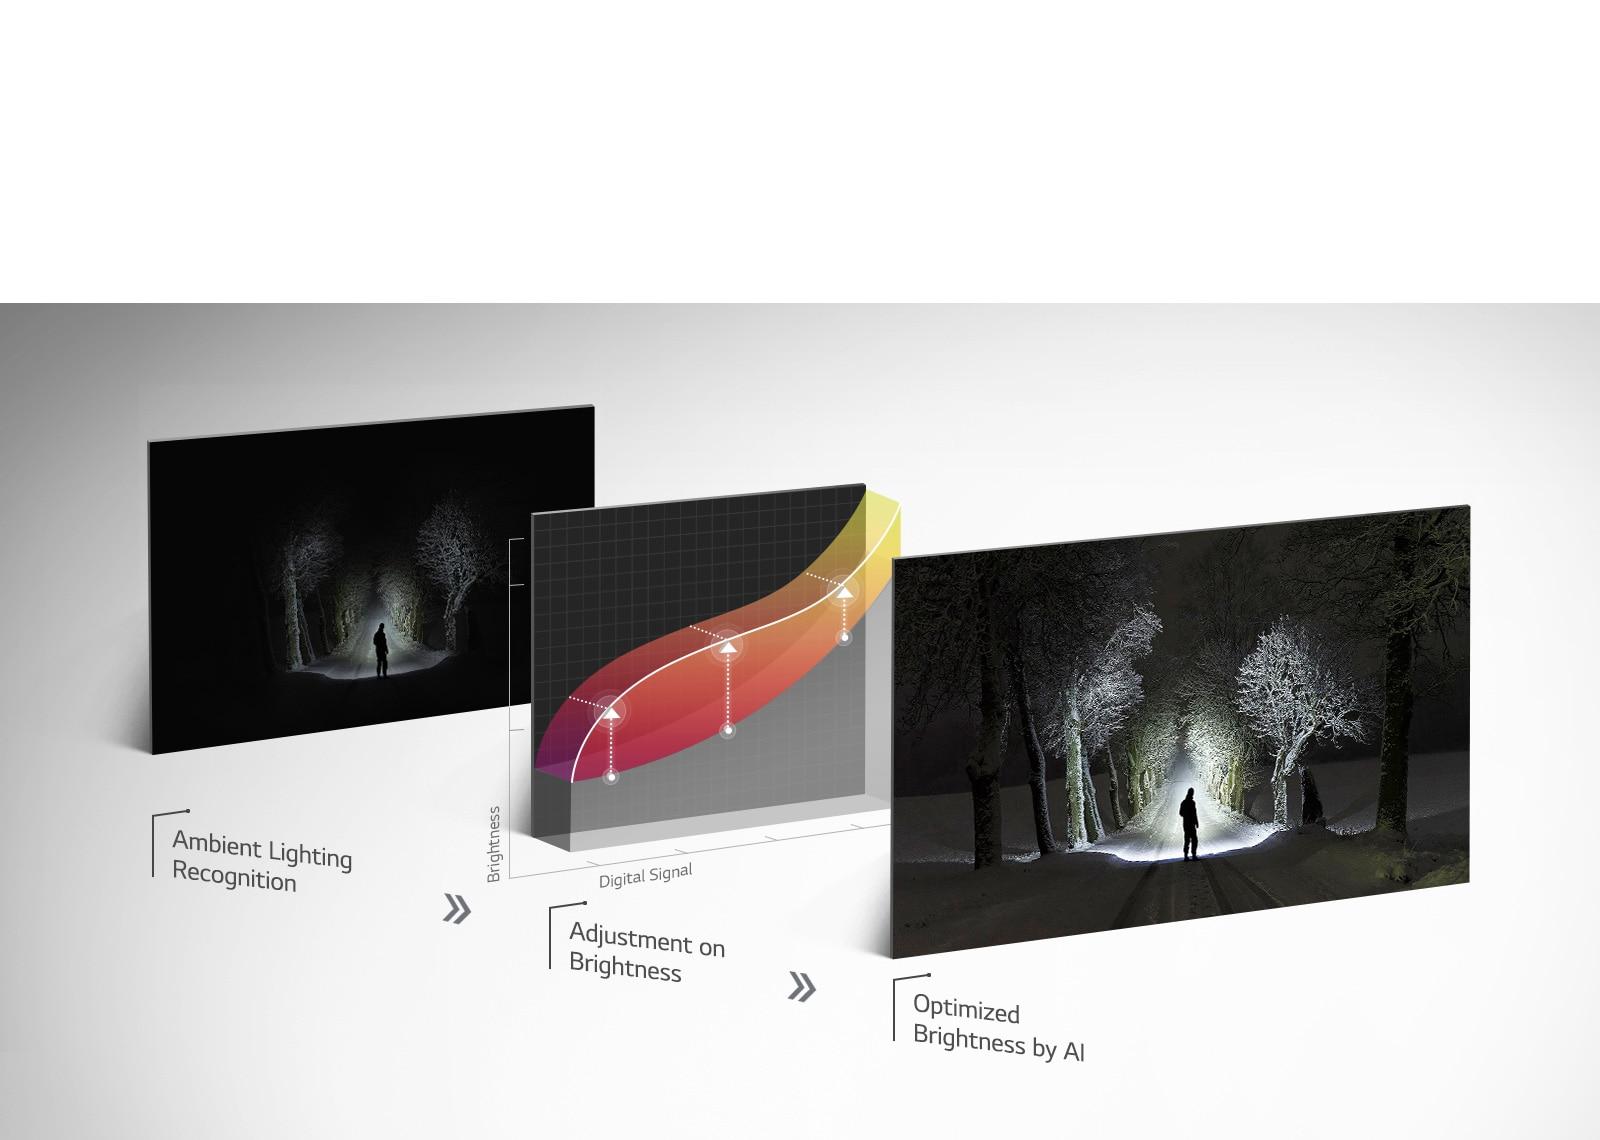 LG AI Brightness OLED TV